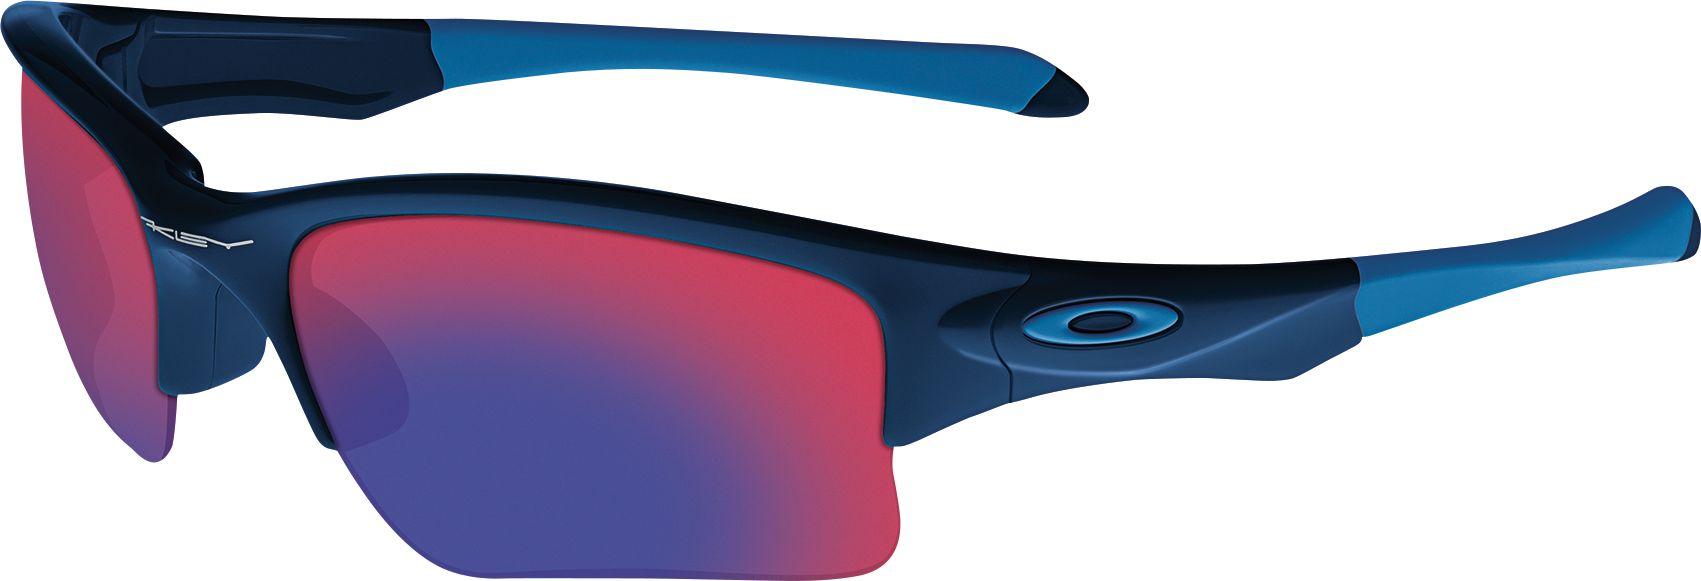 339aba0b0c Cheap Oakley Sunglasses Kids « Heritage Malta